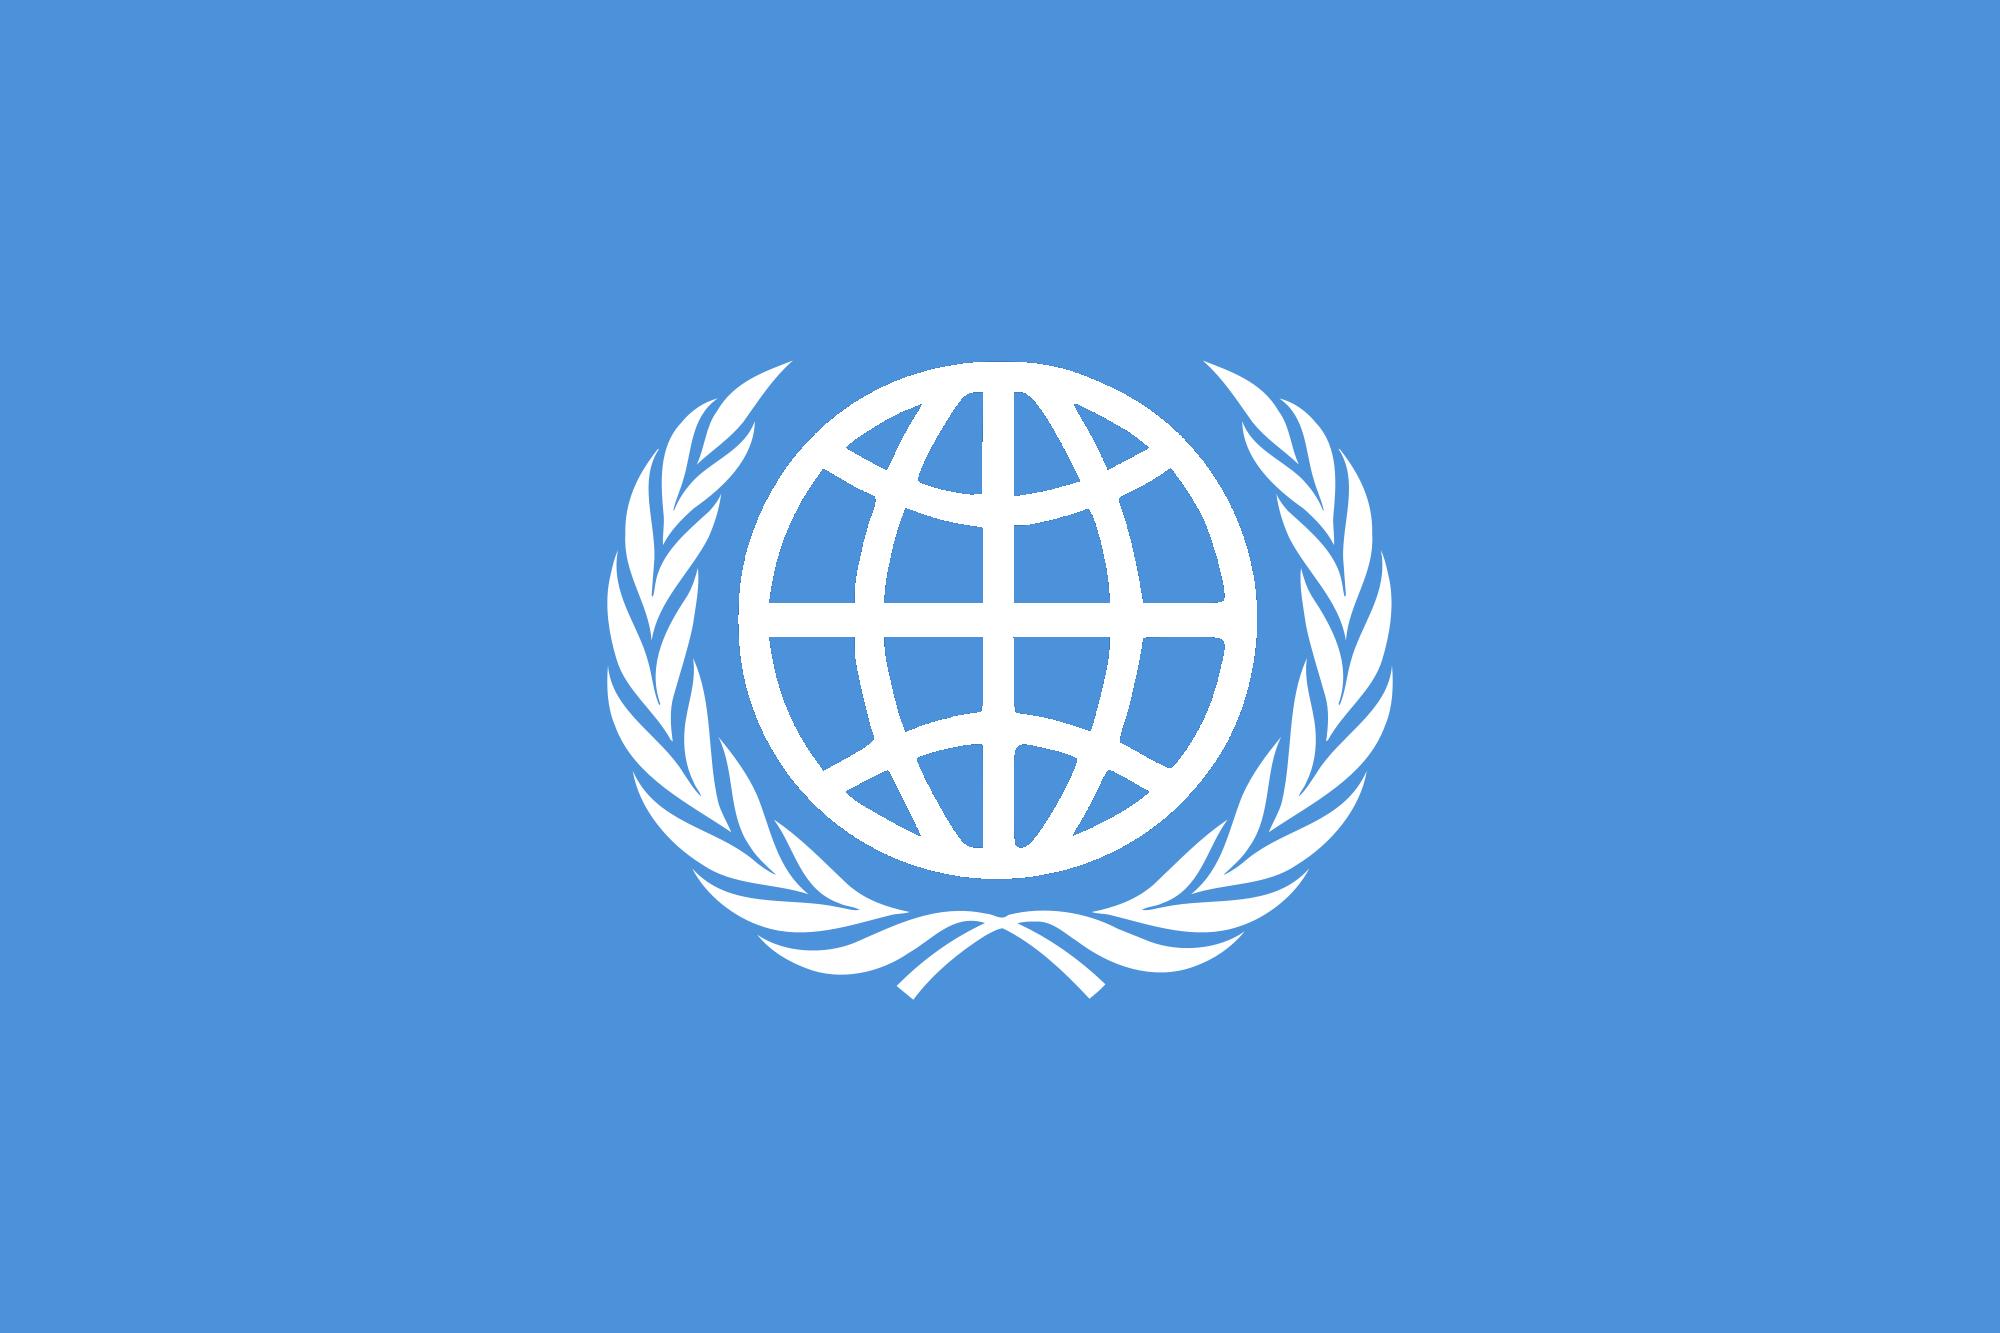 The World Bank 1945 Company Logo Messenger Logo Flags Of The World